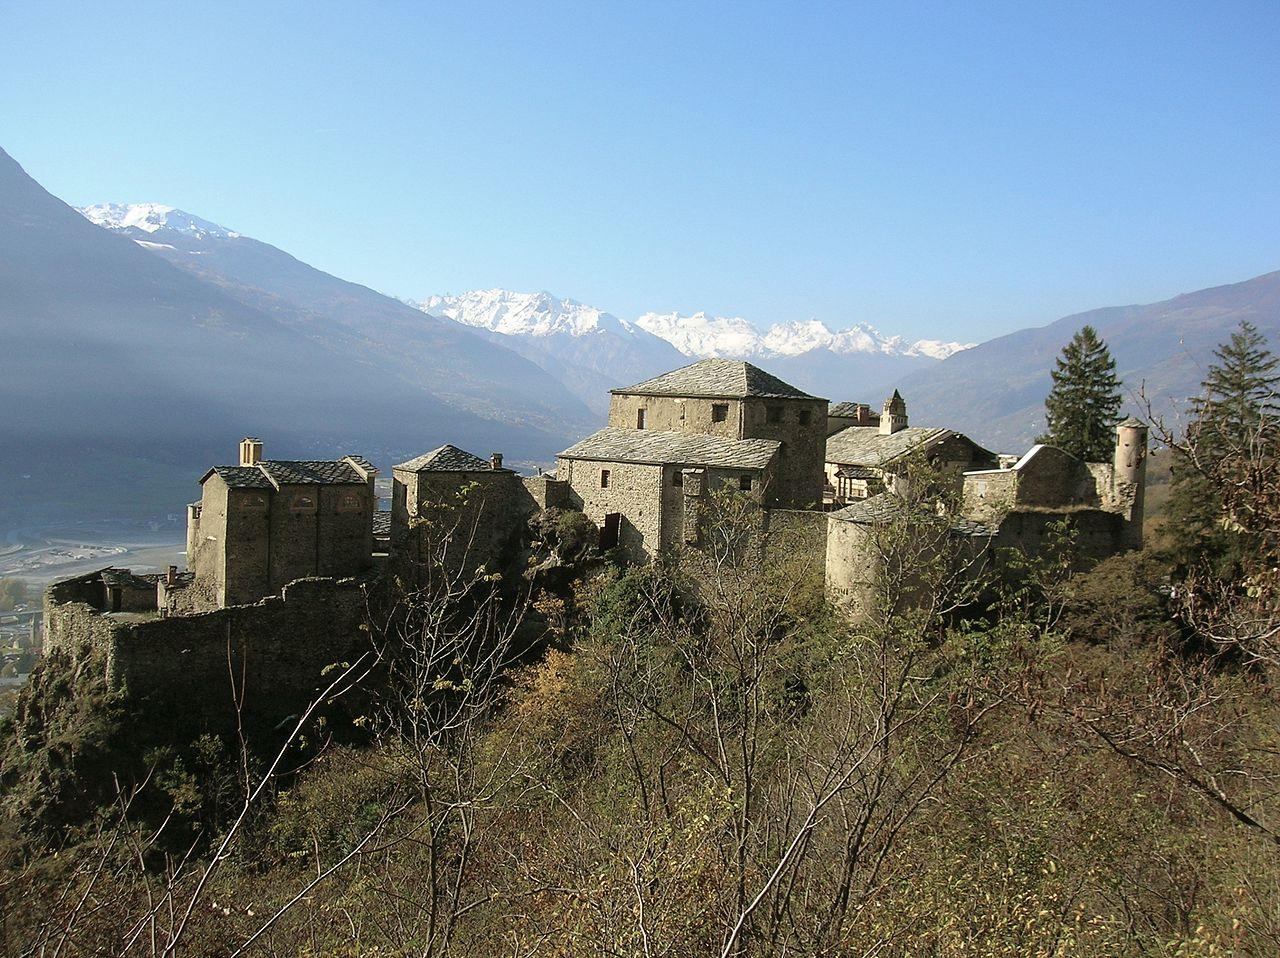 1280px-Castello_di_Quart_(AO)